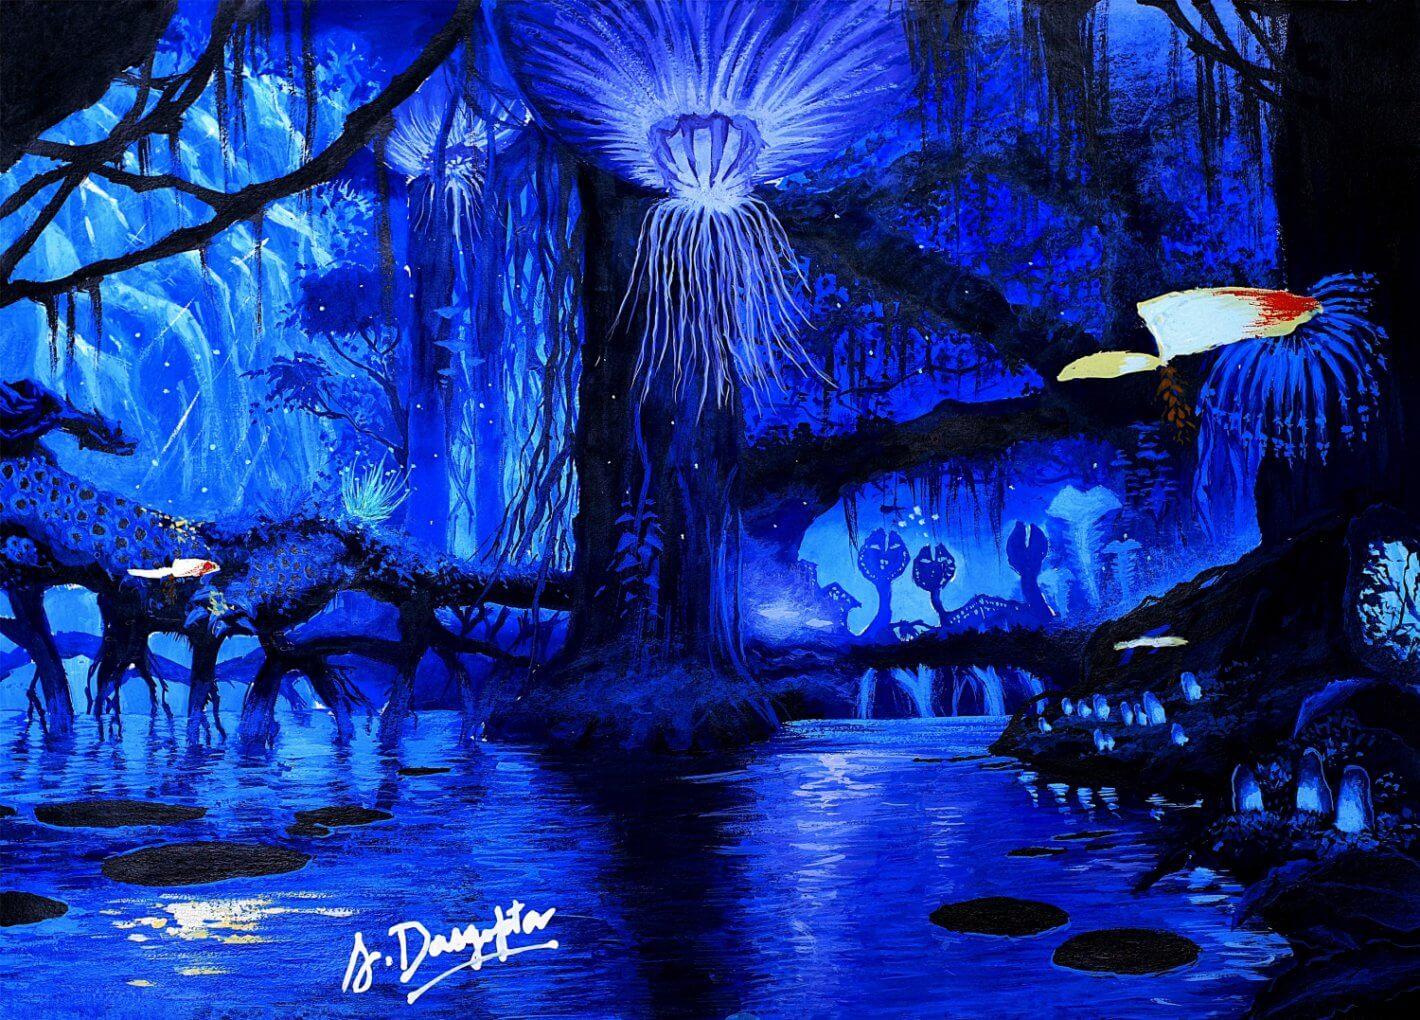 Hohlbaum Art I Shouvik Dasgupta I Fantasy Beyond Imagination